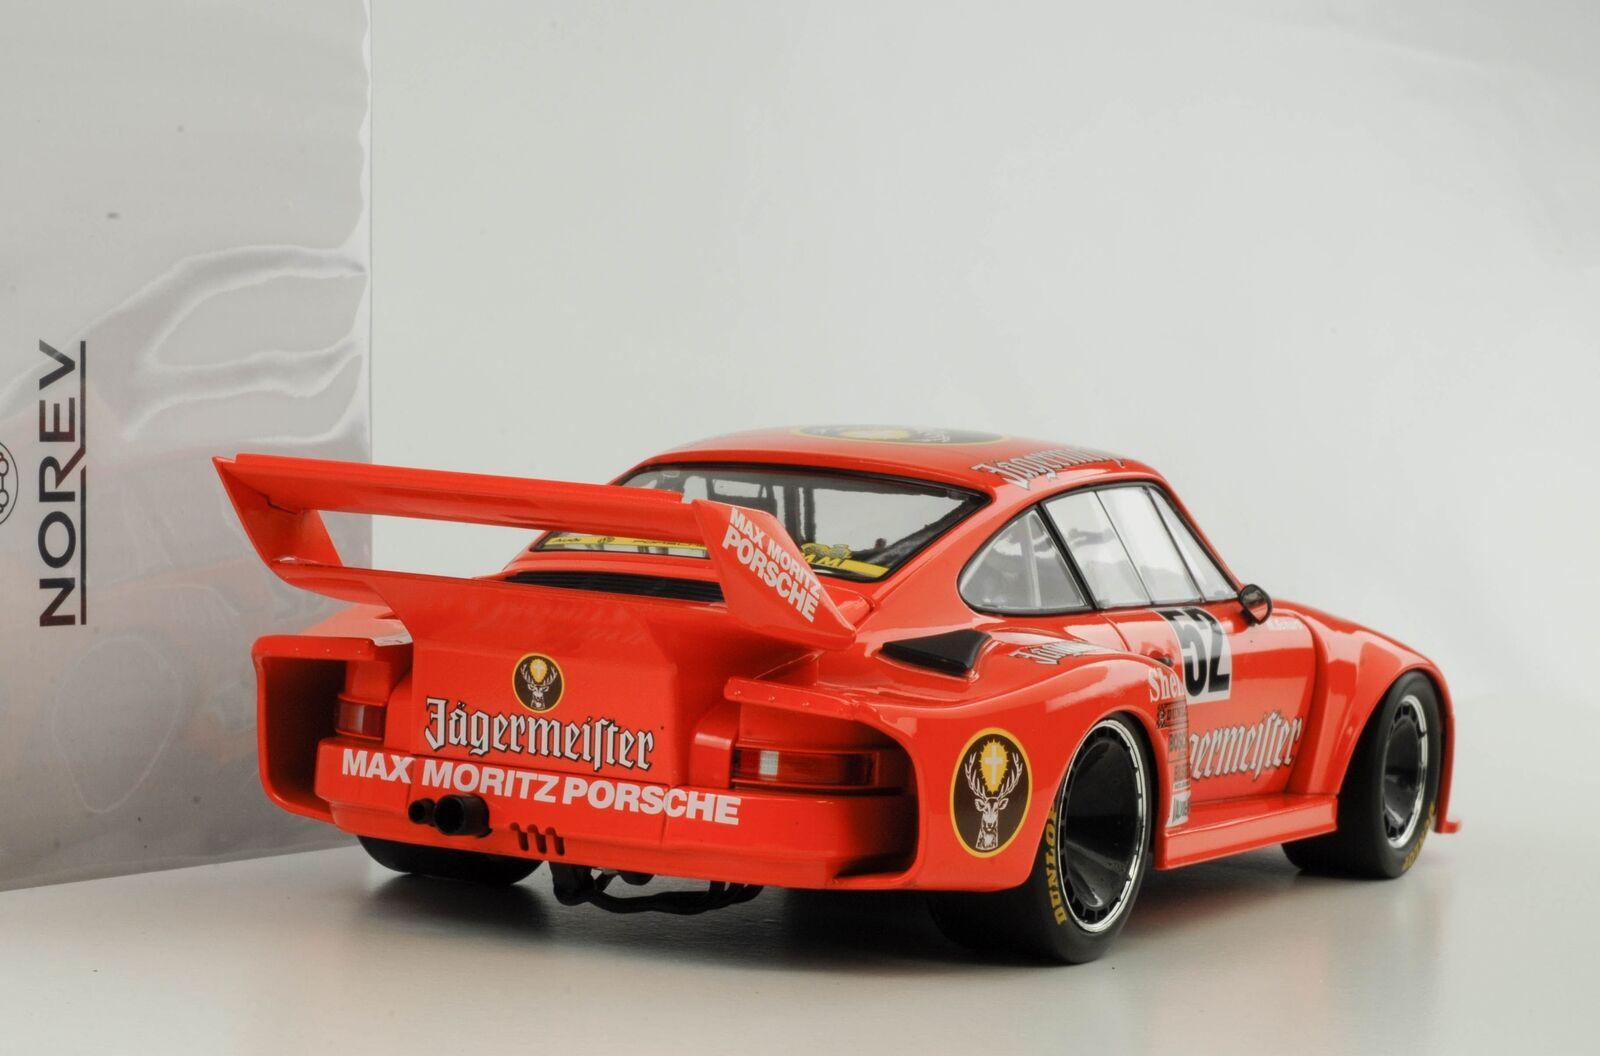 Porsche 935 Jagermeister Winner Bergischer Lion DRM Zolder Schurti 1 18 Norev